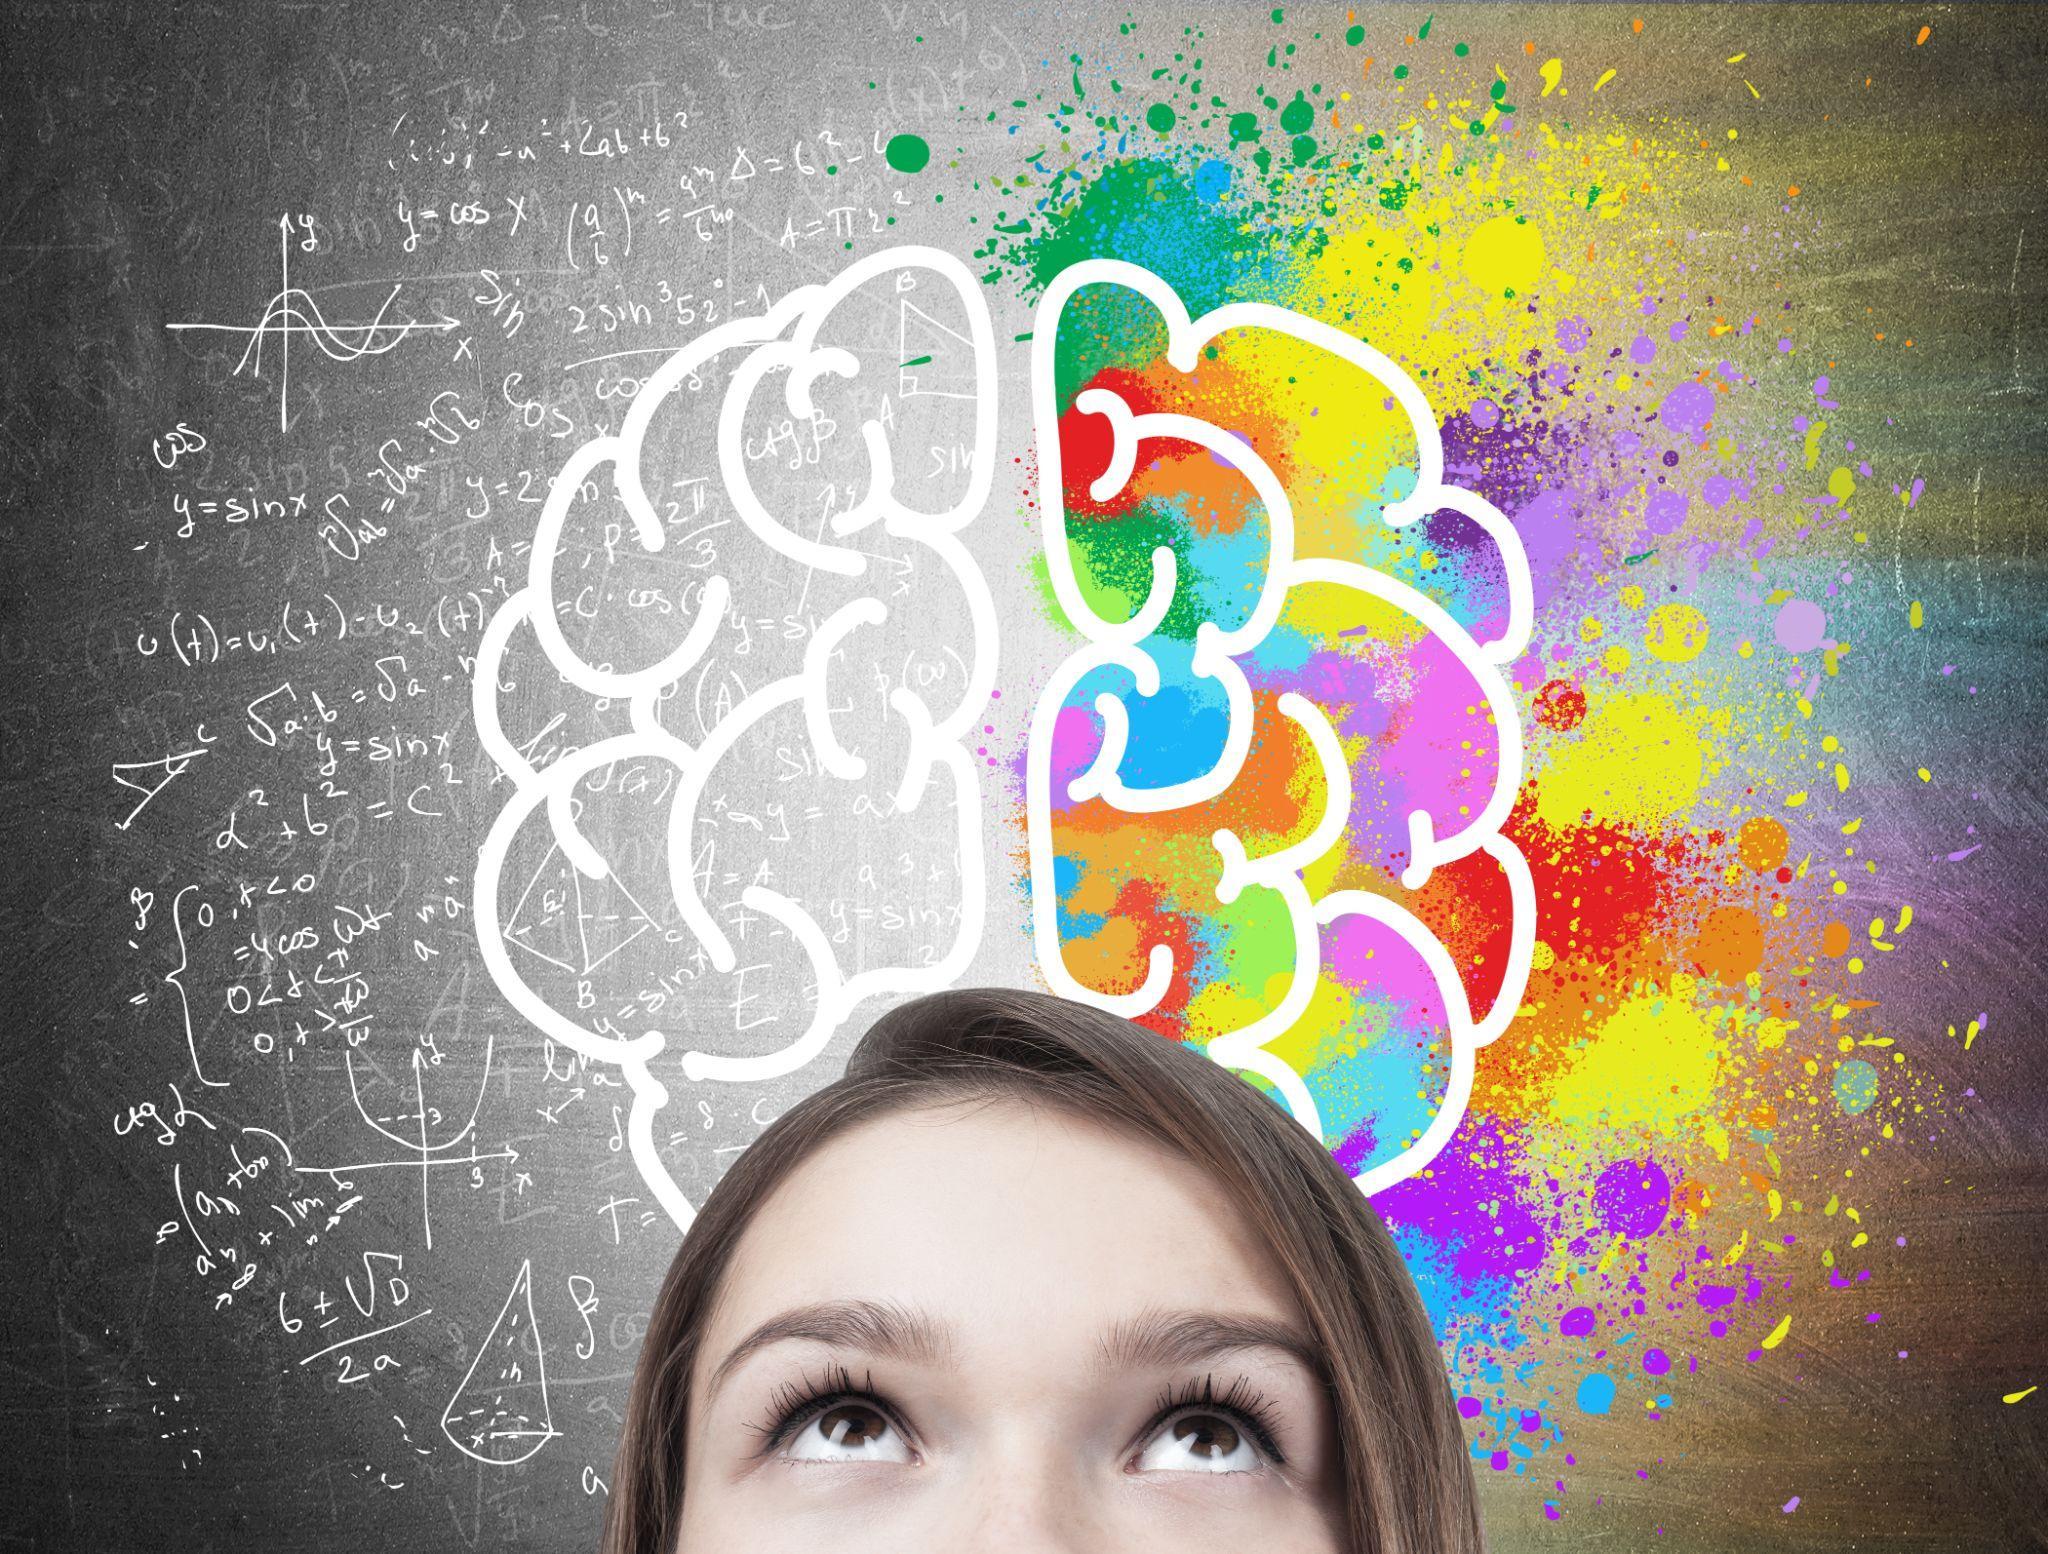 teen girl's head near a blackboard with a colorful brain sketch drawn on top of formulae.